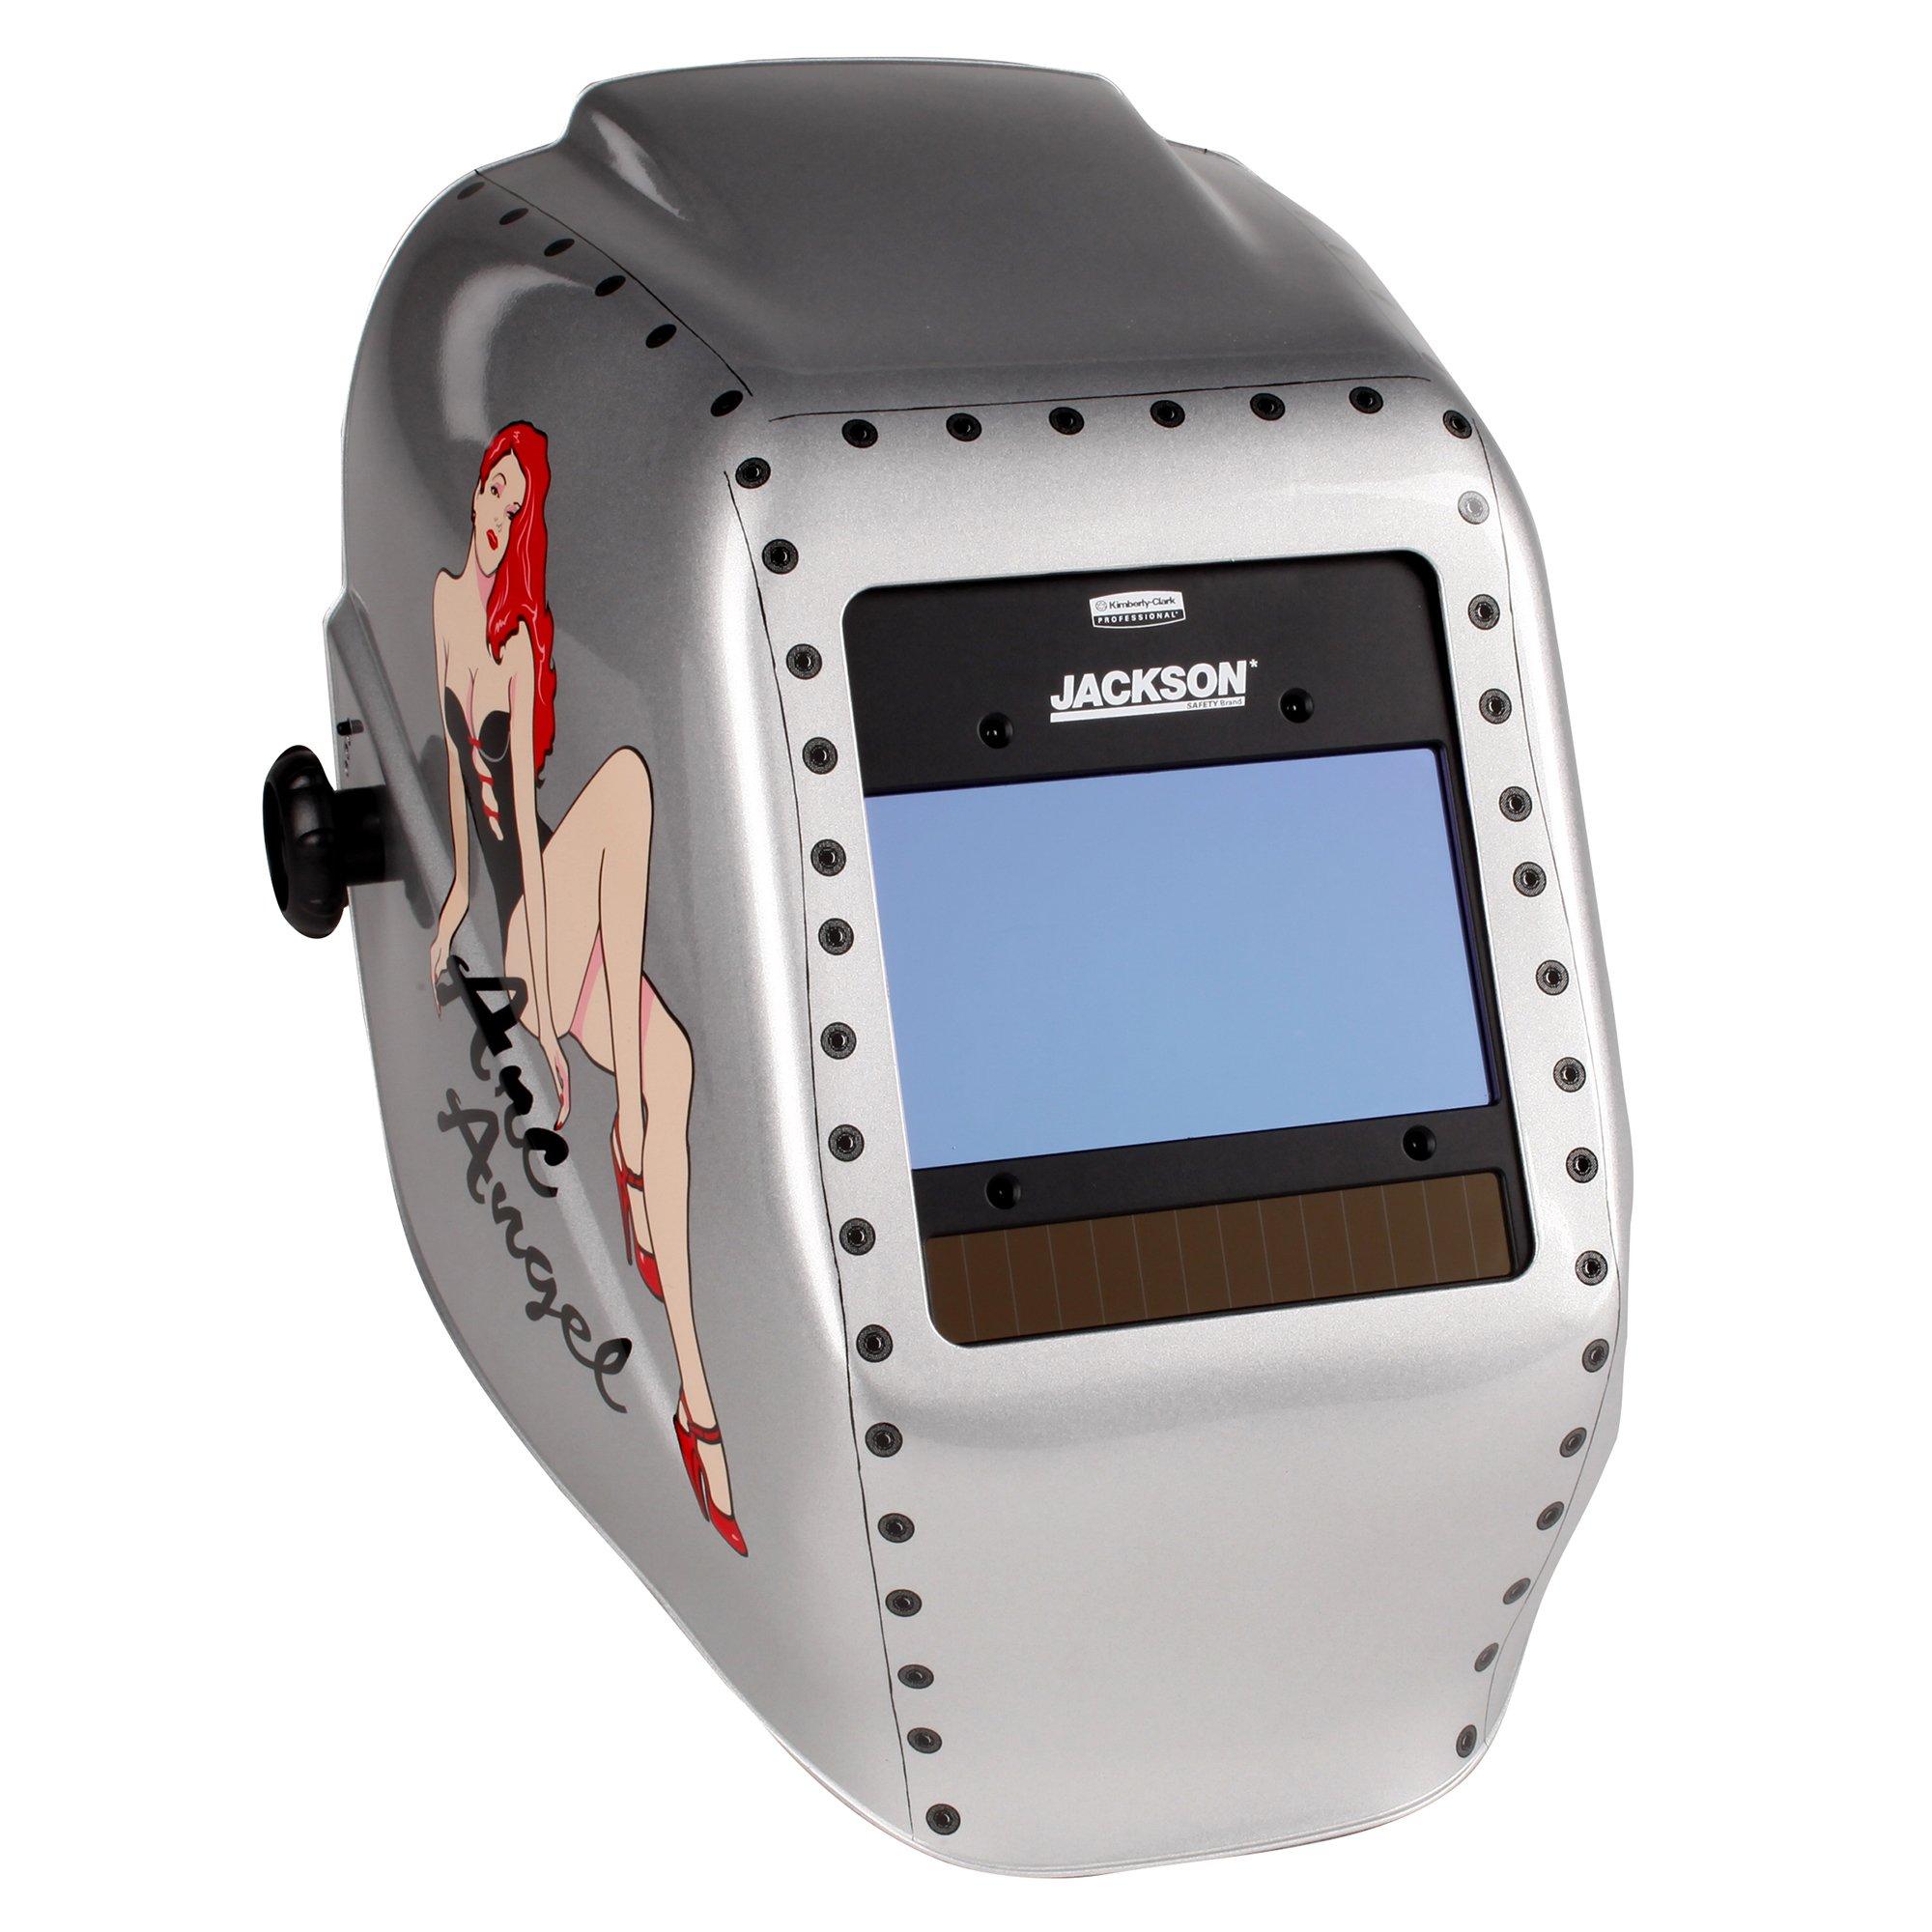 Jackson Safety Insight Variable Auto Darkening Welding Helmet, HaloX (46130), Arc Angel, 1 Helmet / Order